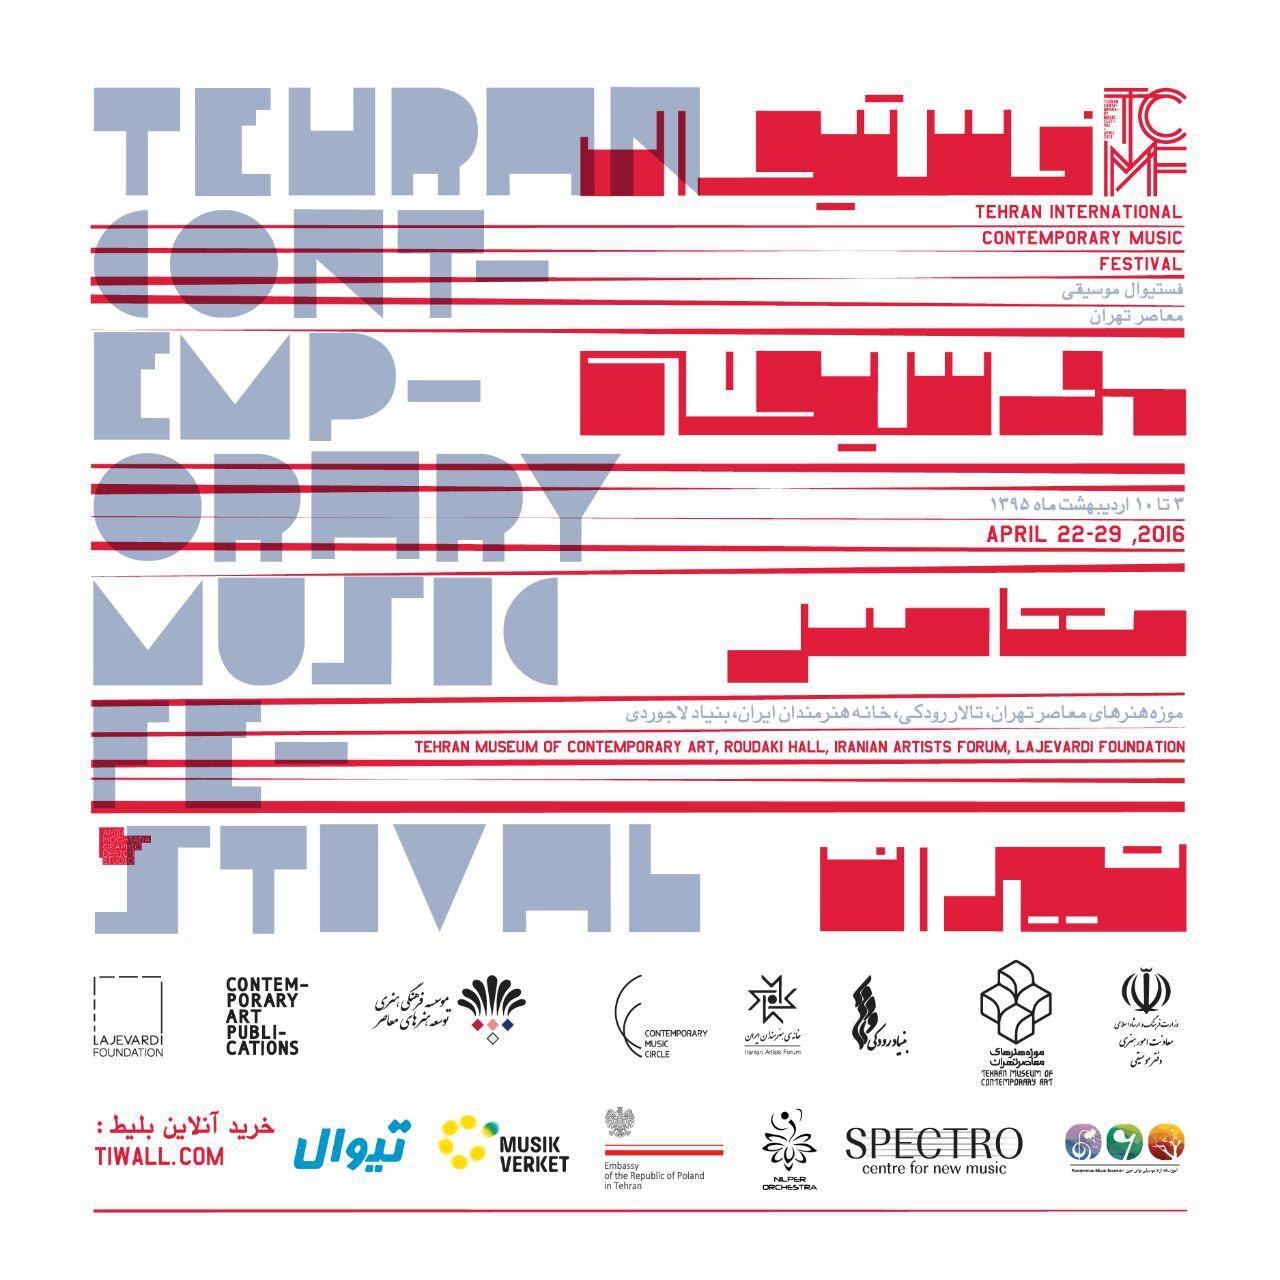 Tehran Contemporary Music Festival